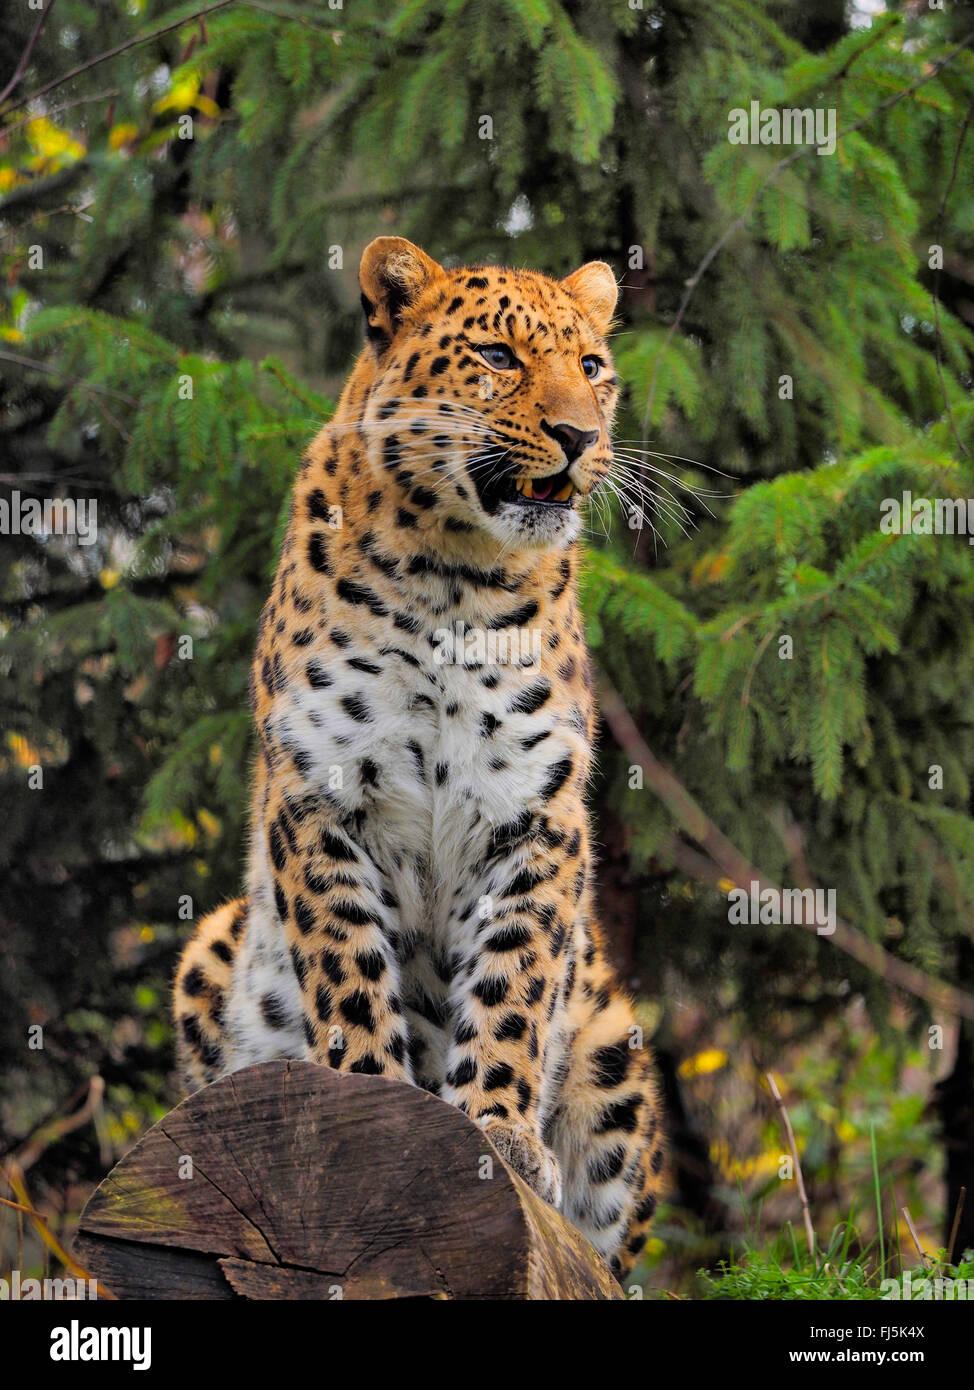 Amur leopard (Panthera pardus orientalis), sitting on a tree trunk - Stock Image